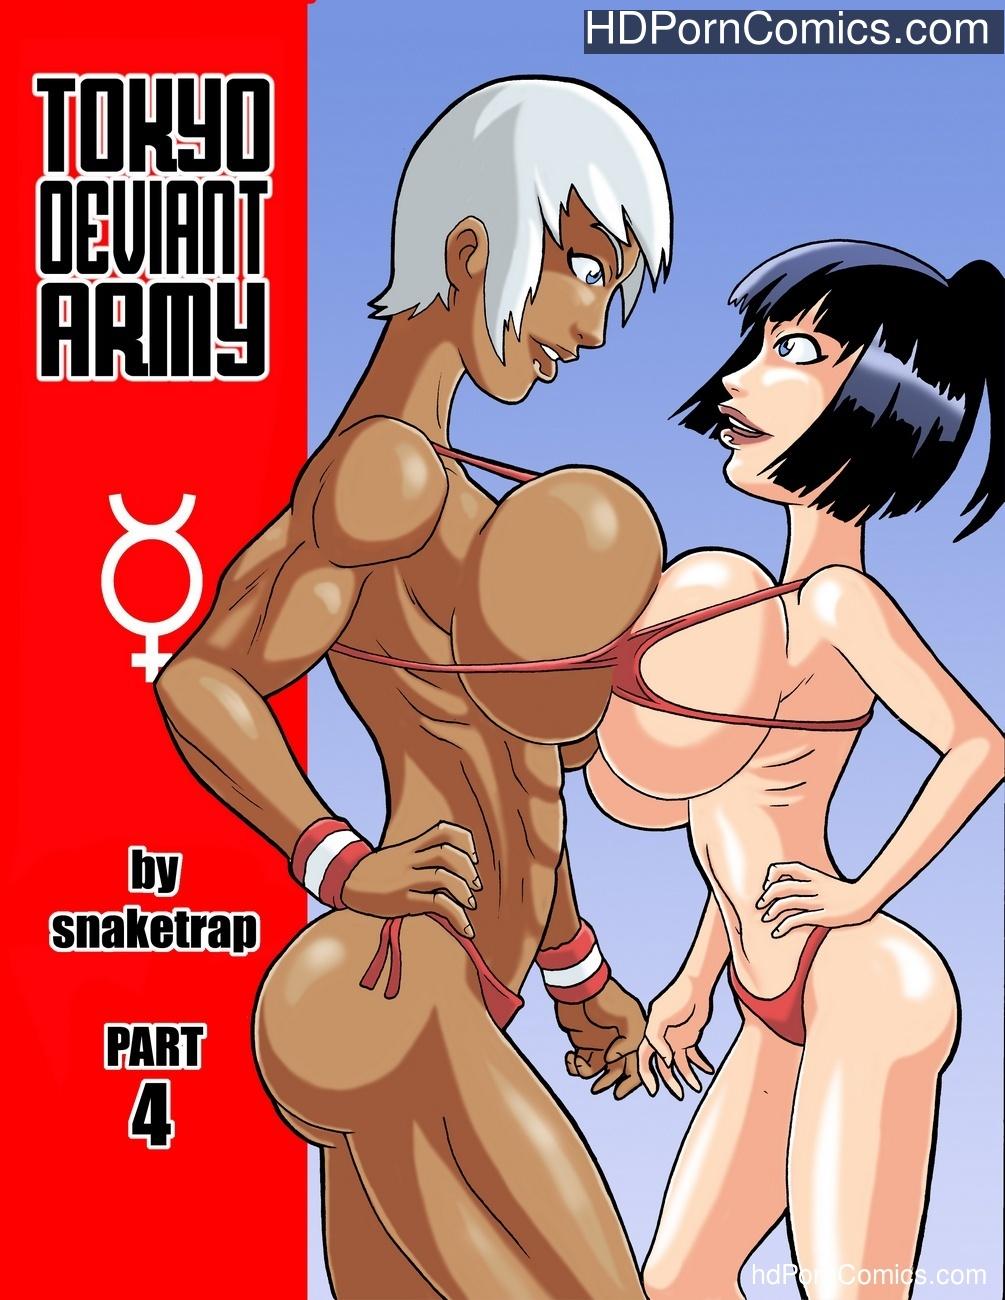 Tokyo Deviant Army 4 Sex Comic